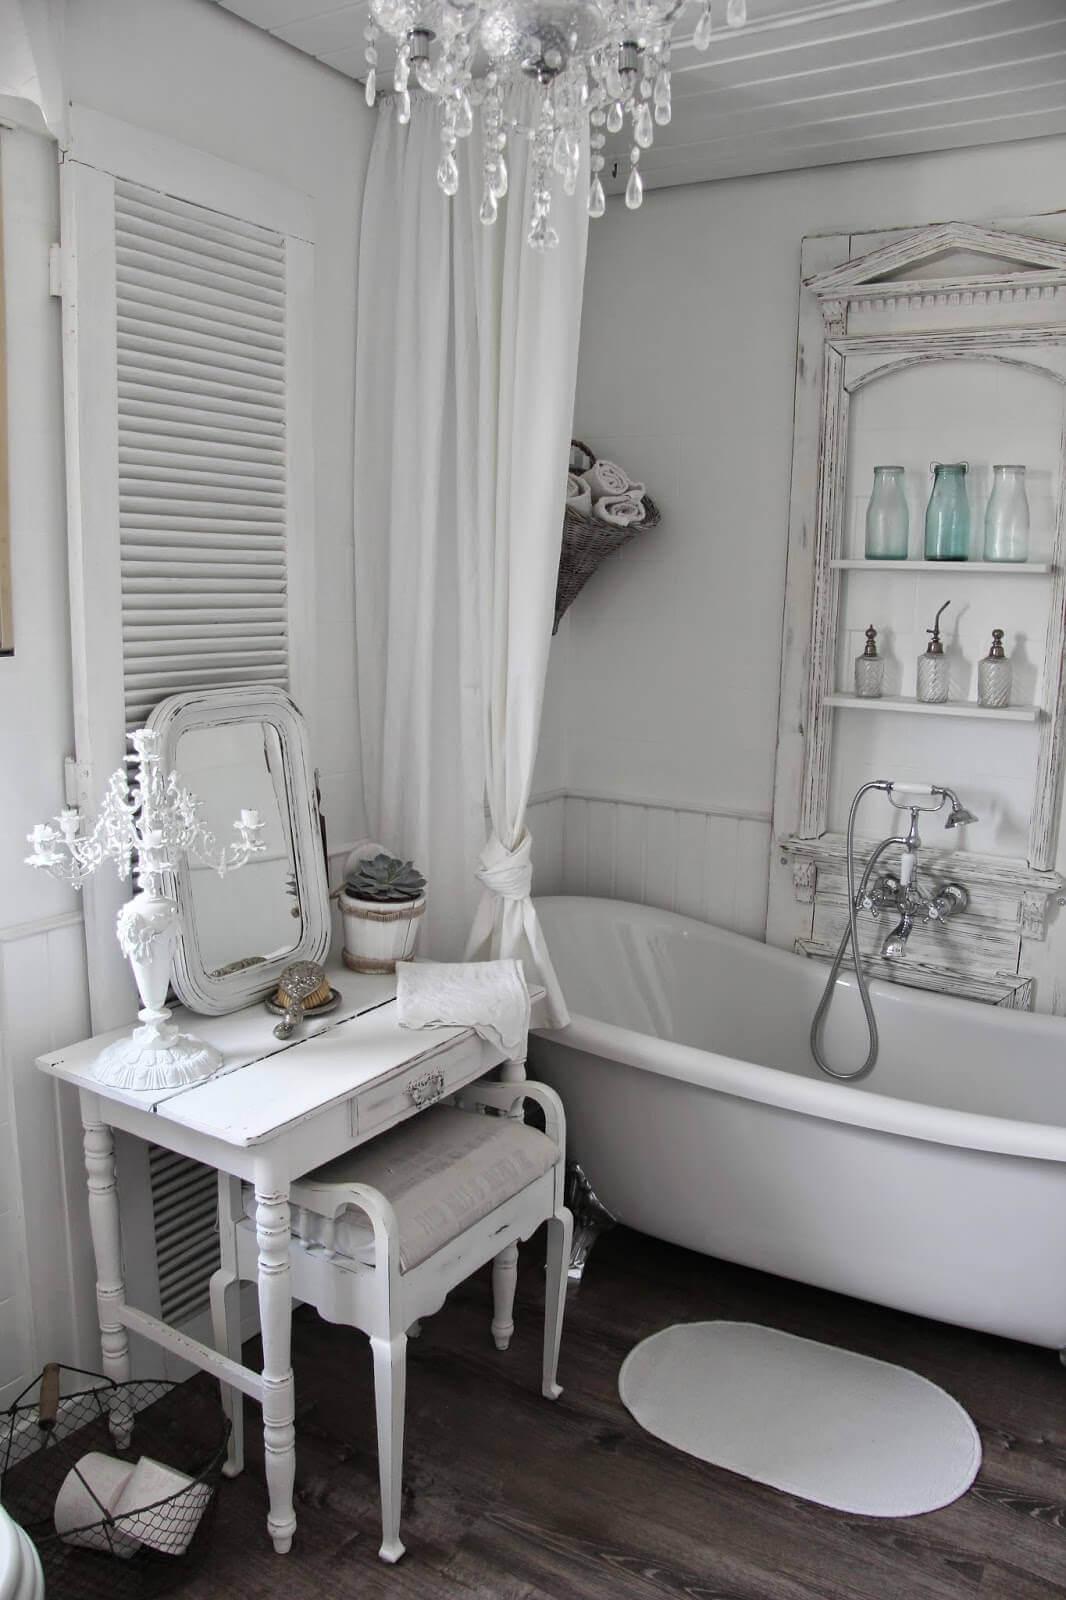 Nice bathroom in shabby chic